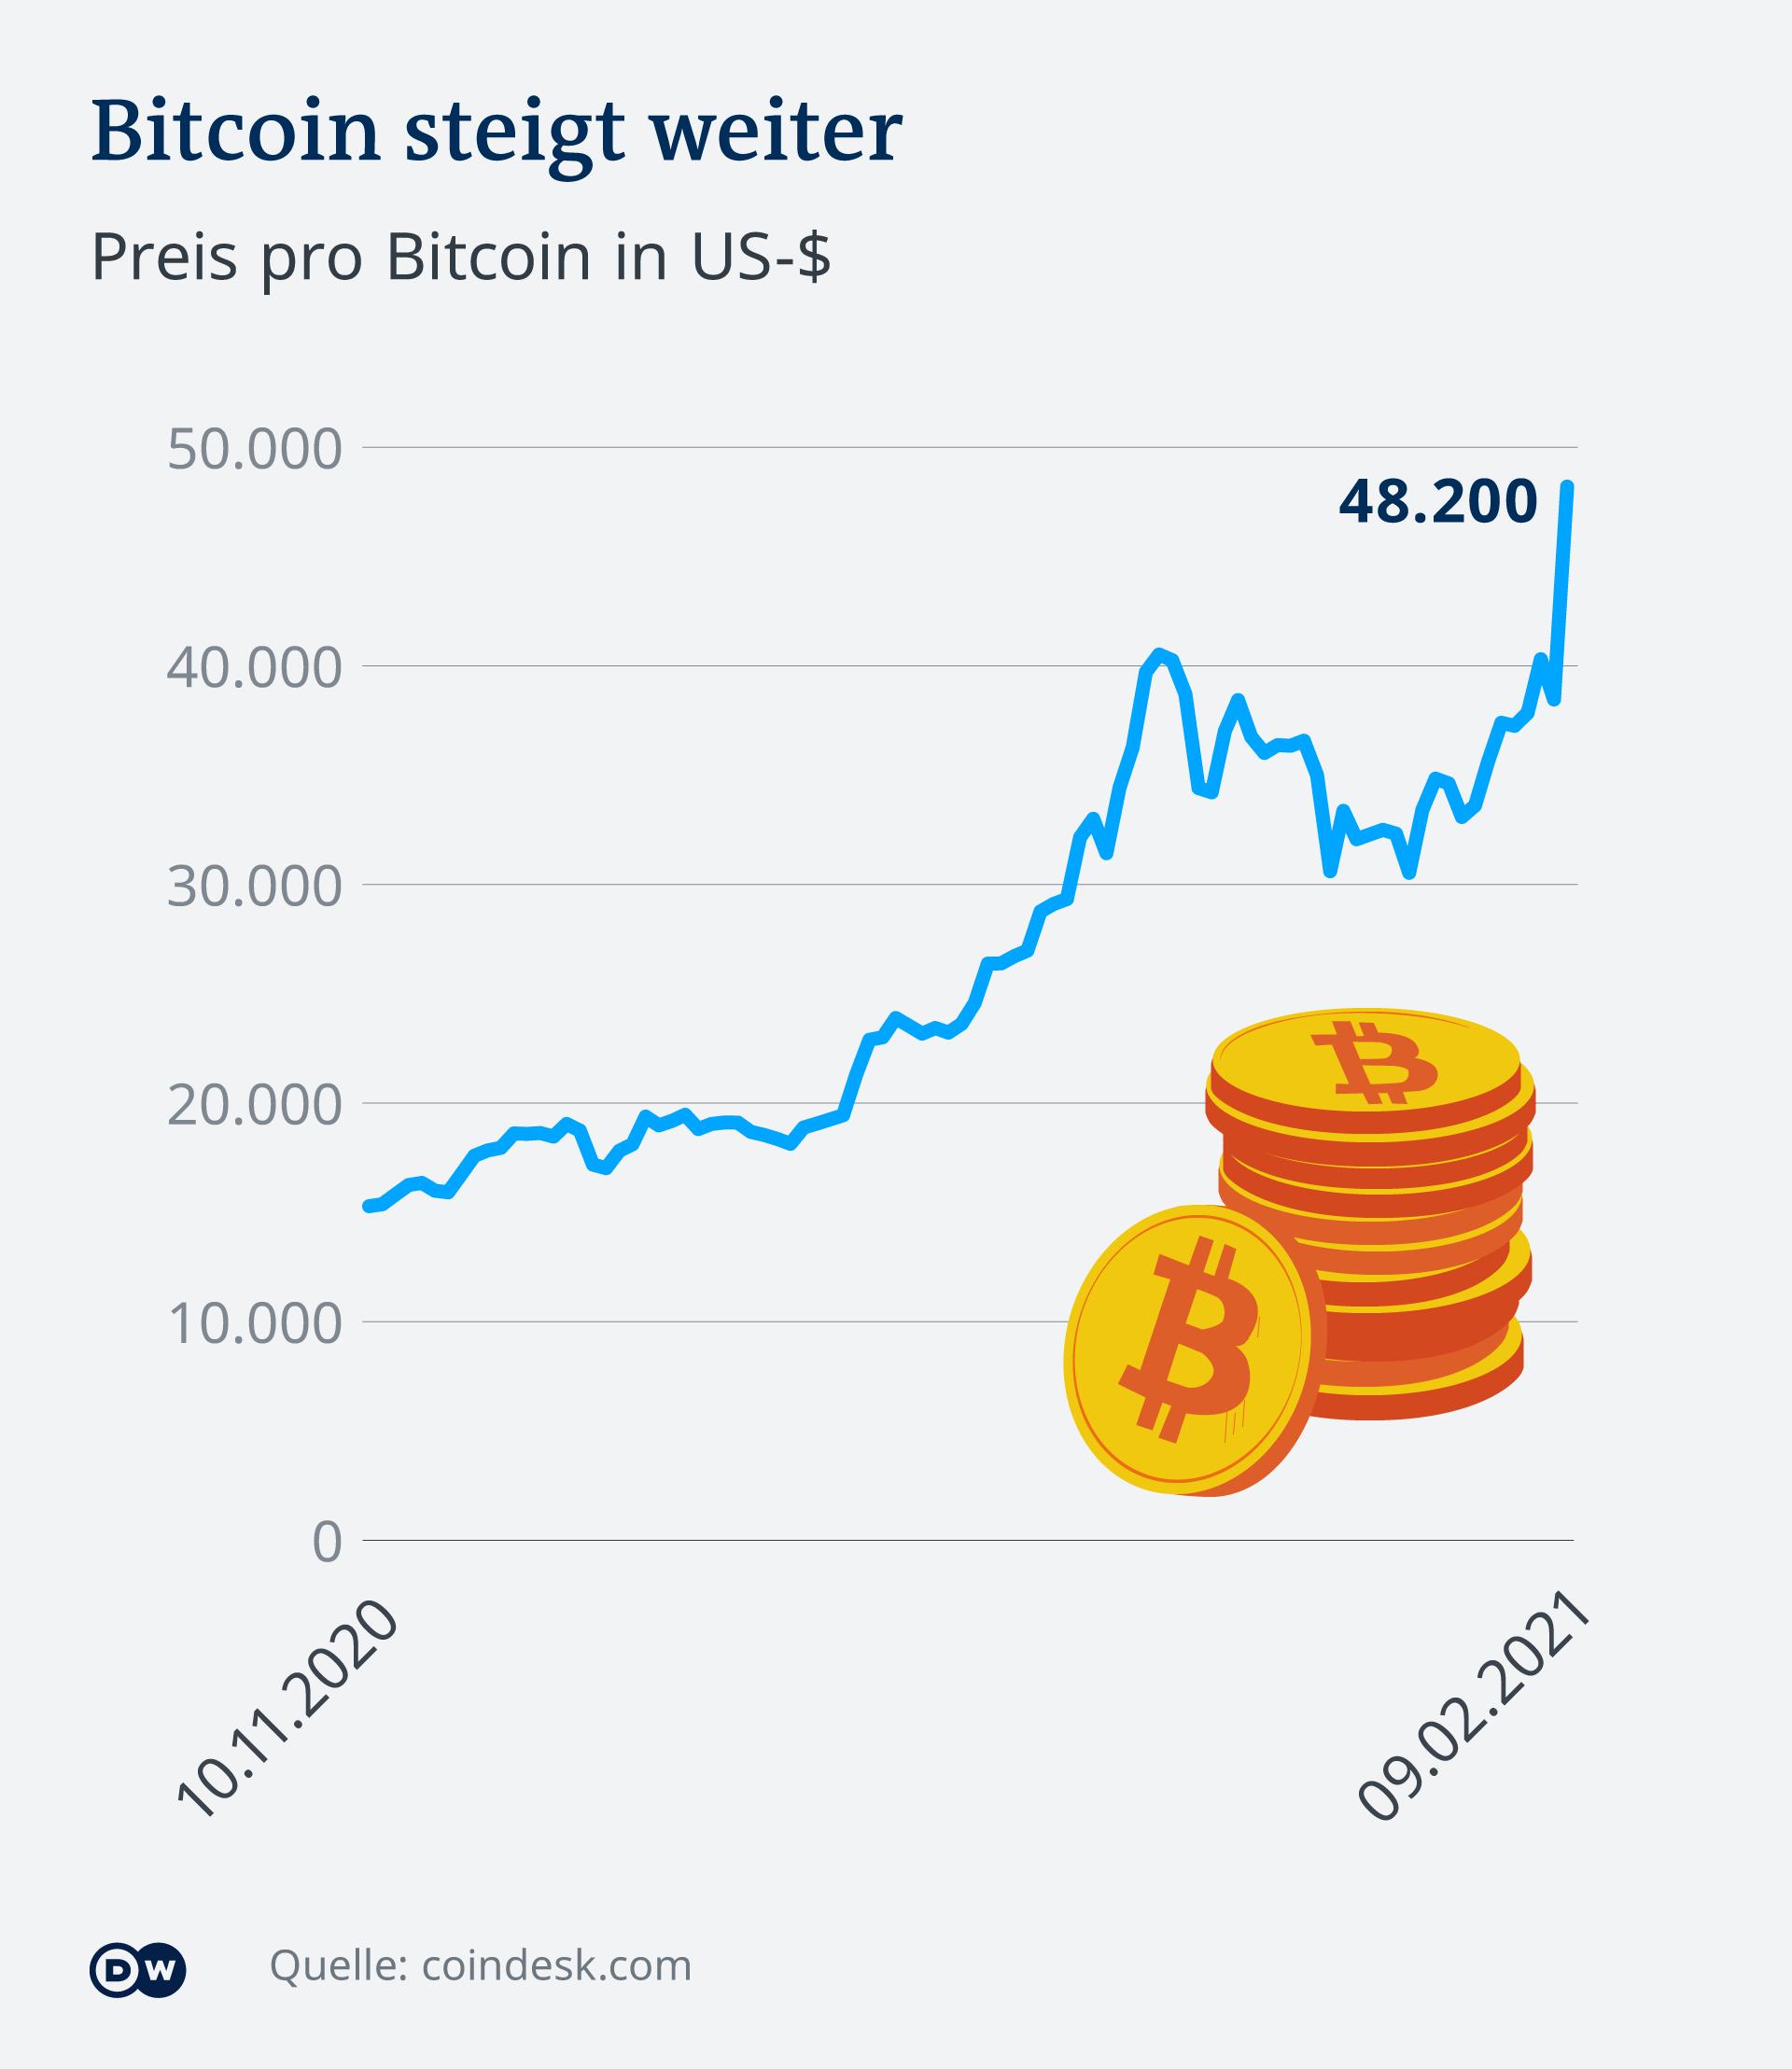 Bitcoin-Kurs, Ether-Kurs & Co: Aktuelle News von heute zu Kryptowährungen